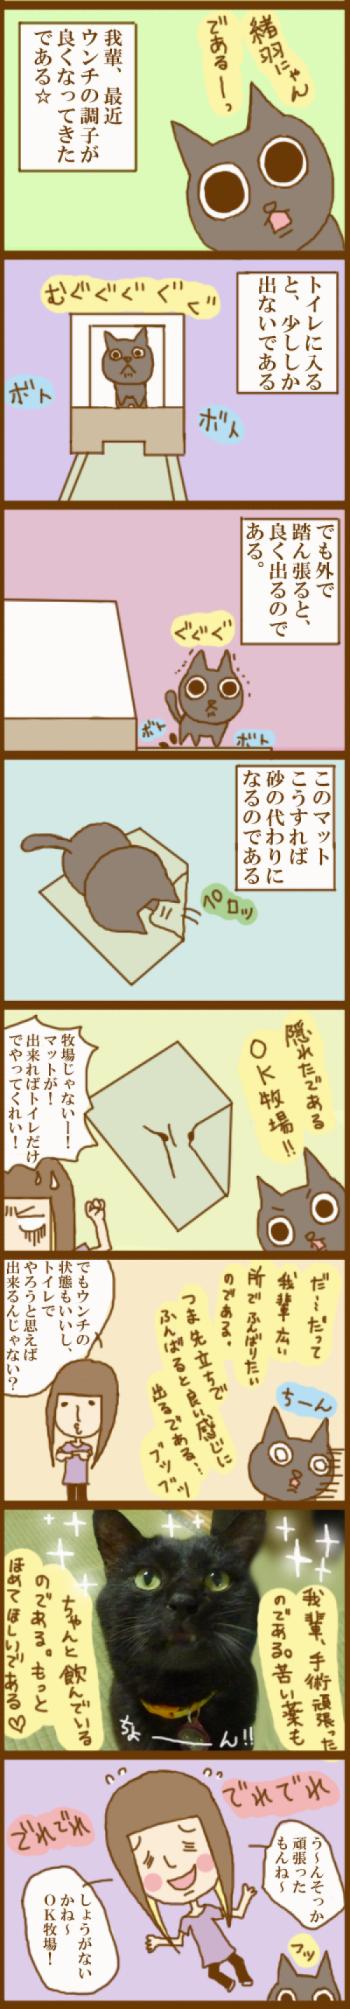 f:id:suzuokayu:20201119101426j:plain